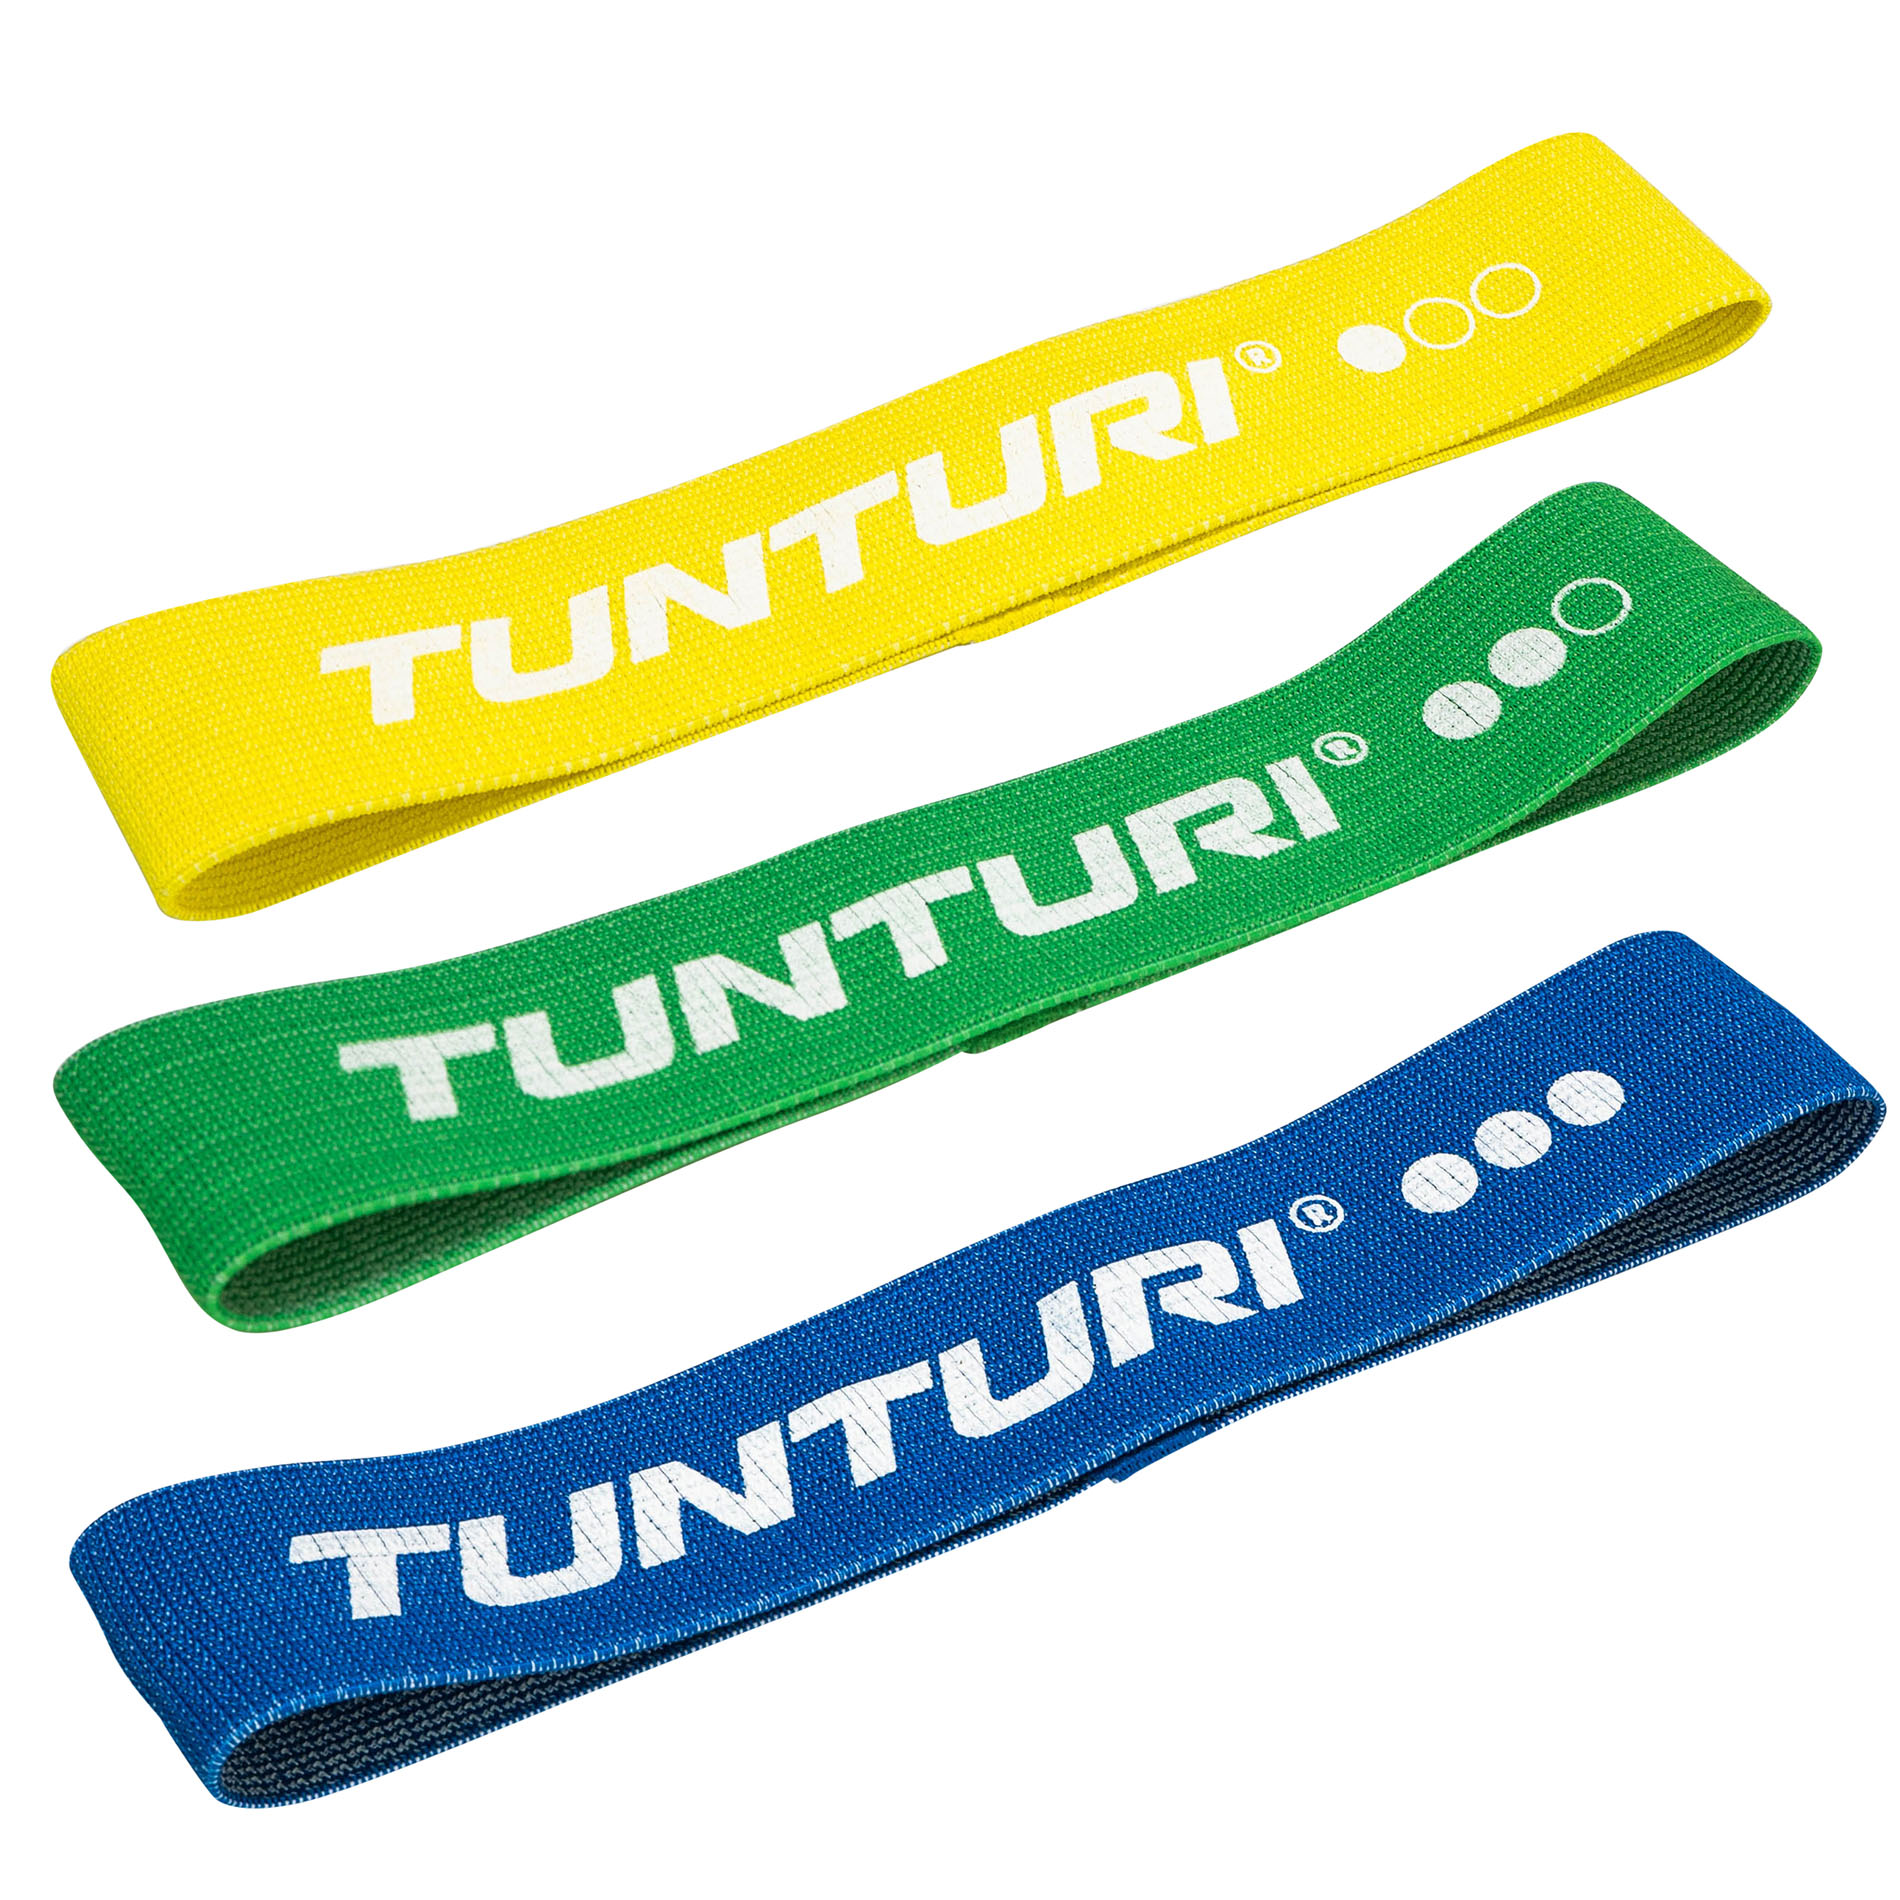 Weerstandsband textiel Set - resistance band